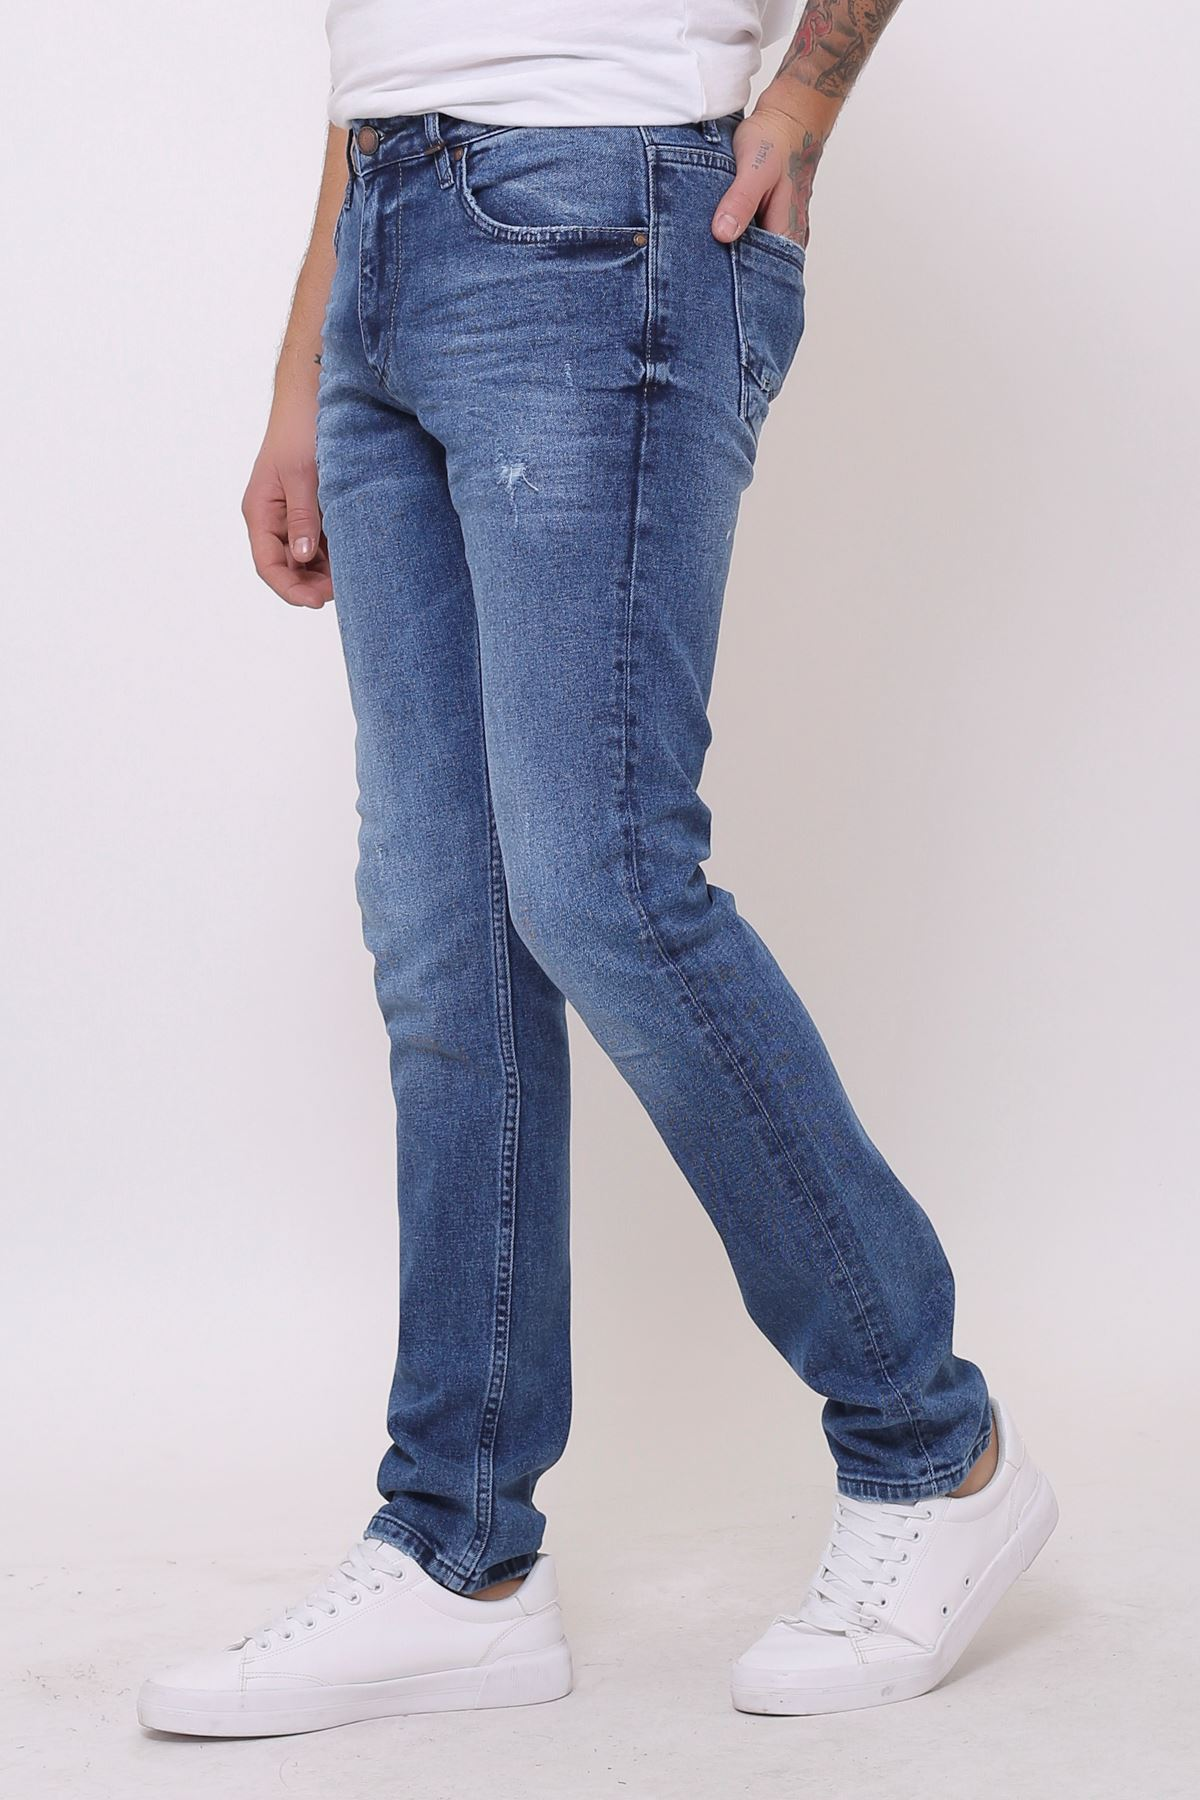 Yeni Mavi Slim Fit Fermuarlı Erkek Jeans Pantolon